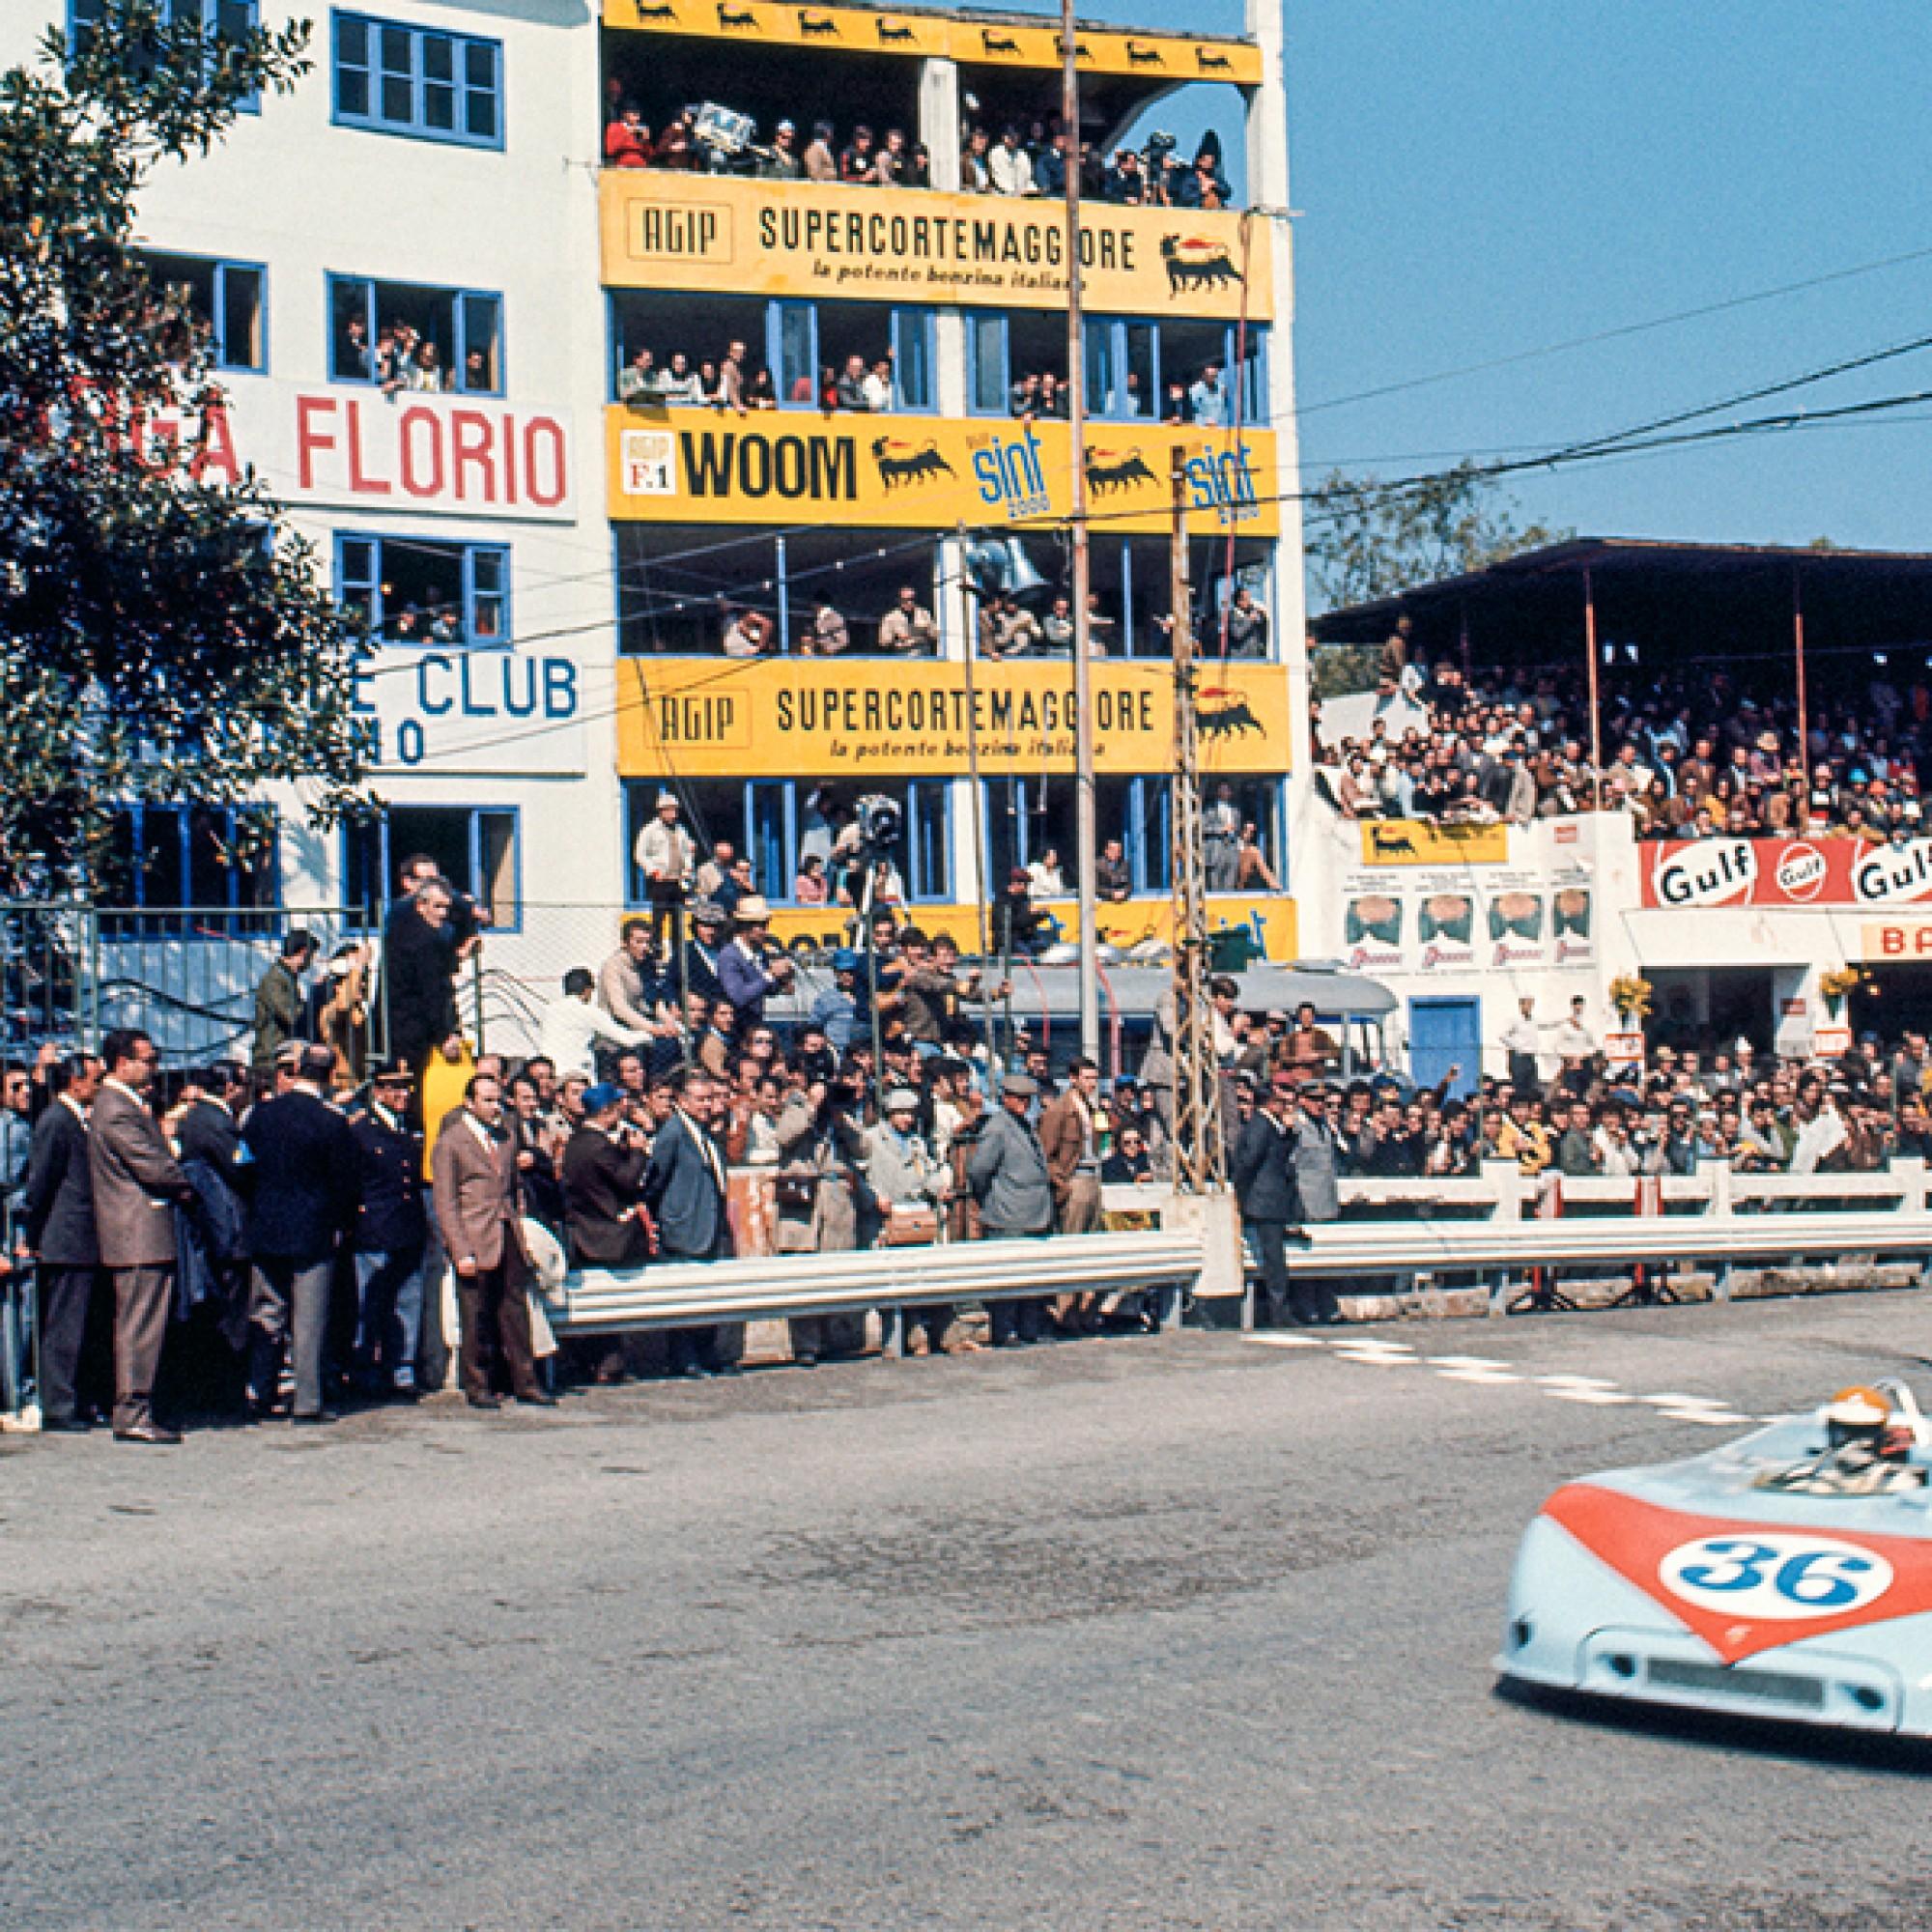 Björn Waldegård im Porsche 908/03 an der Targa Florio 1970 in Sizilien. Foto: Tony Triolo.  (motorsportfriends.ch, Museum im Bellpark)